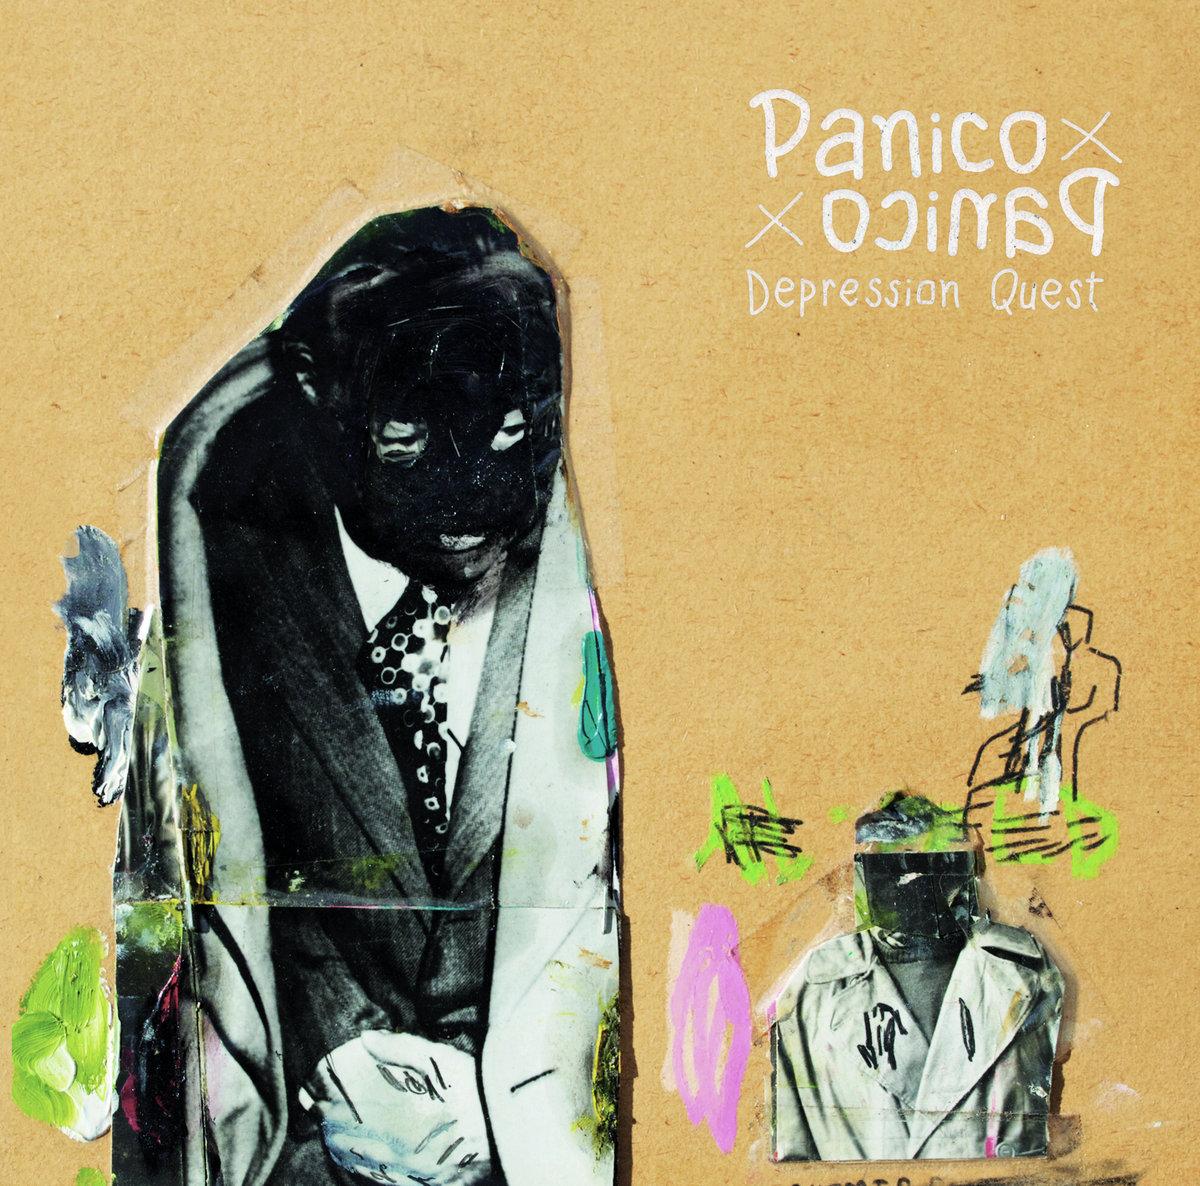 PANICO PANICO - Depression Quest